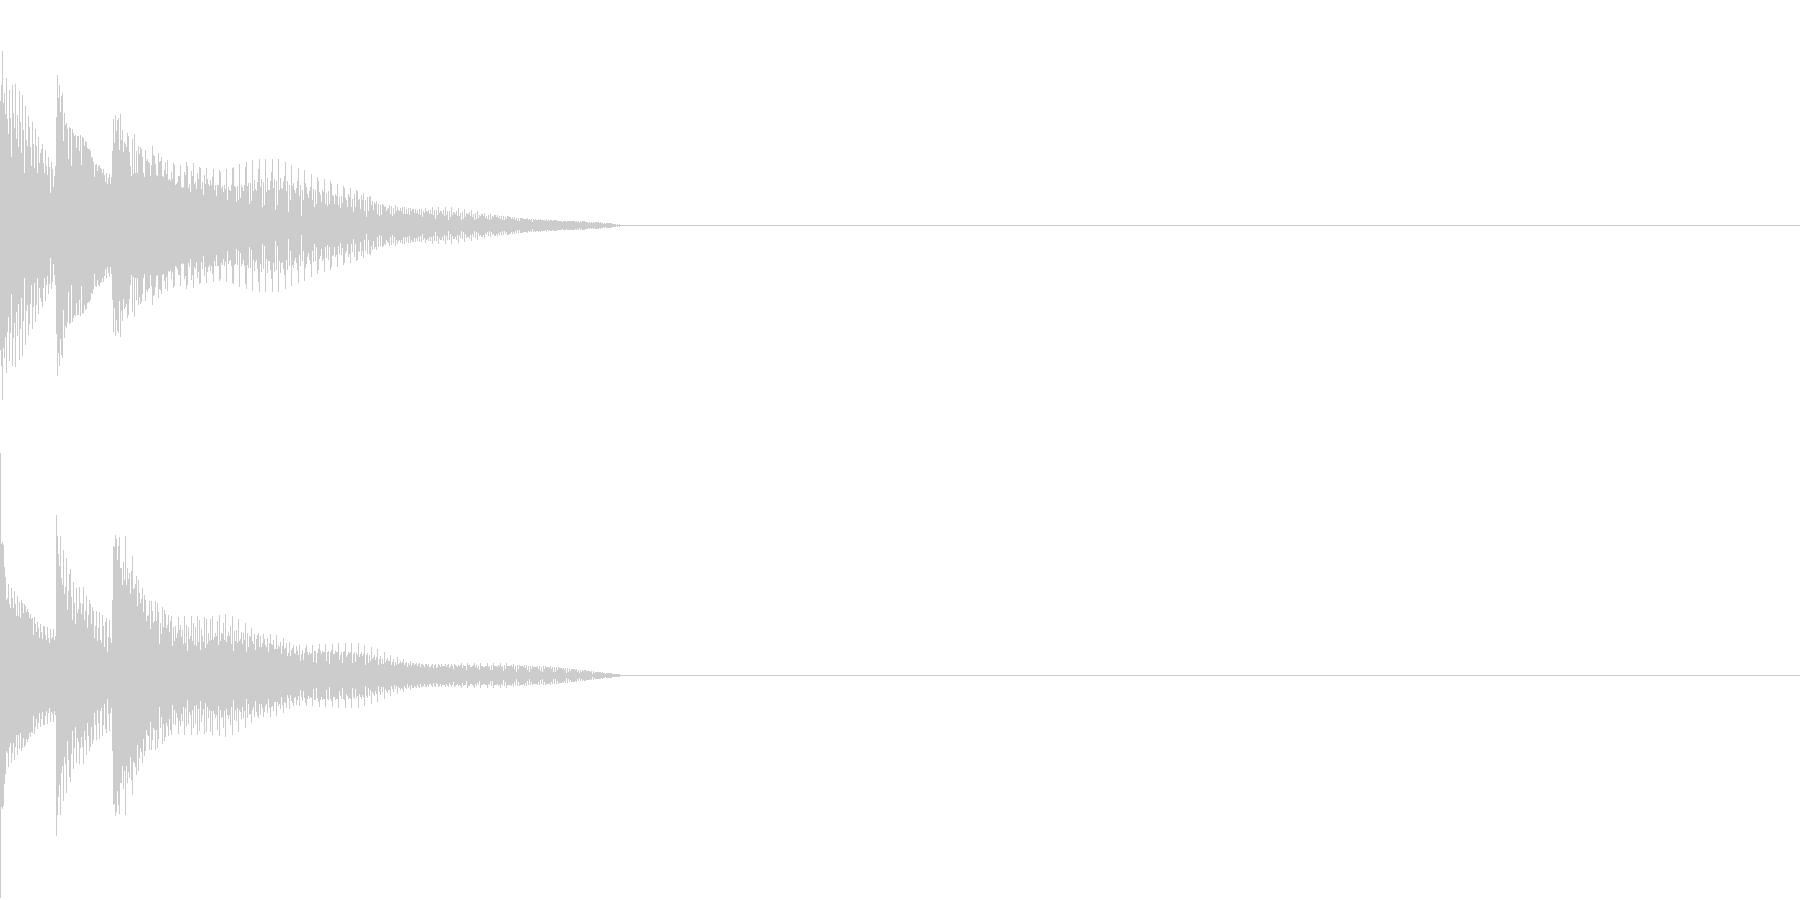 Cursor セレクト・カーソルの音10の未再生の波形